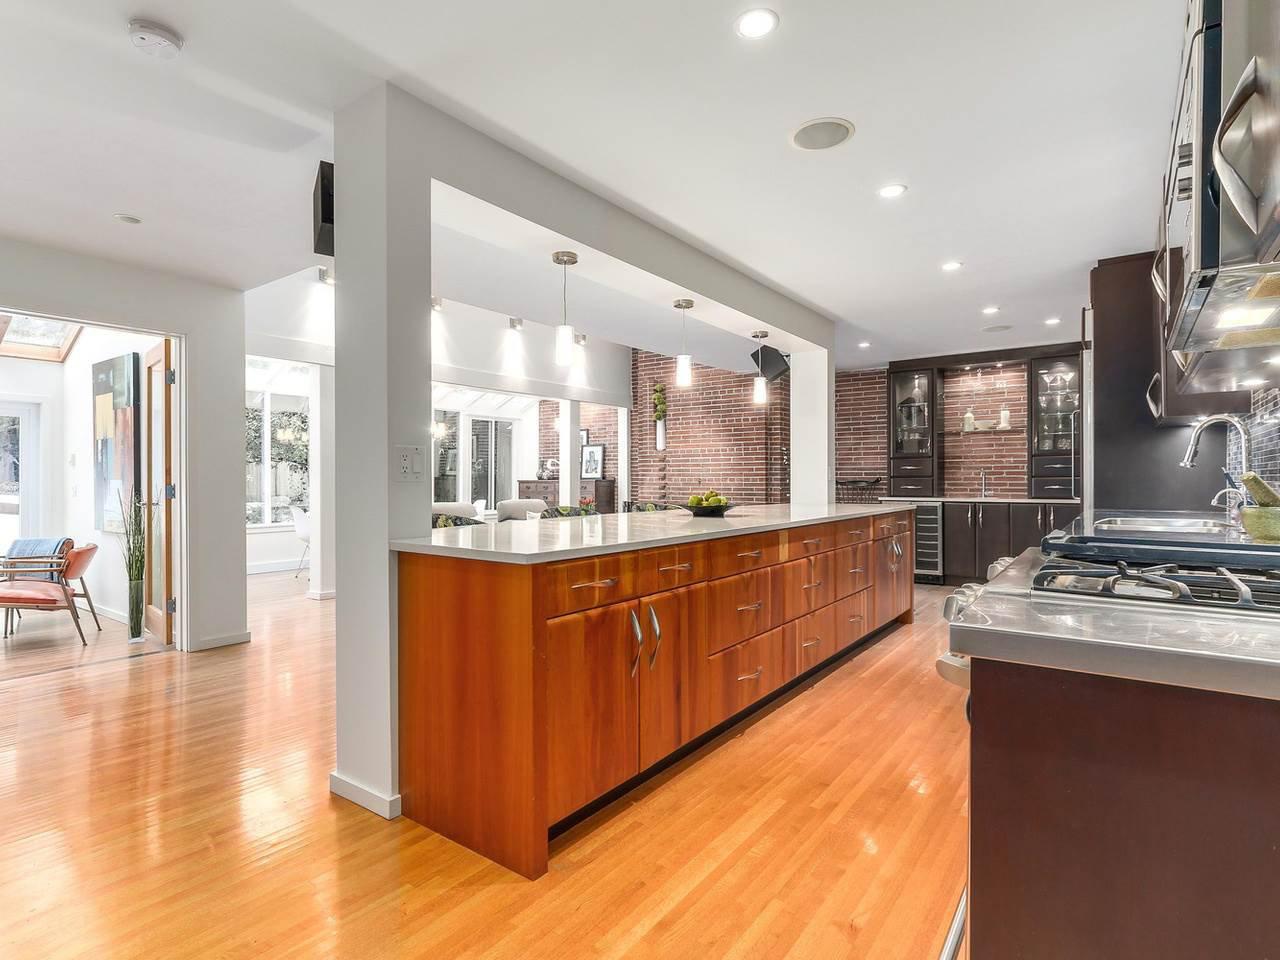 Photo 2: Photos: 3708 EDGEMONT Boulevard in North Vancouver: Edgemont House Fourplex for sale : MLS®# R2138514